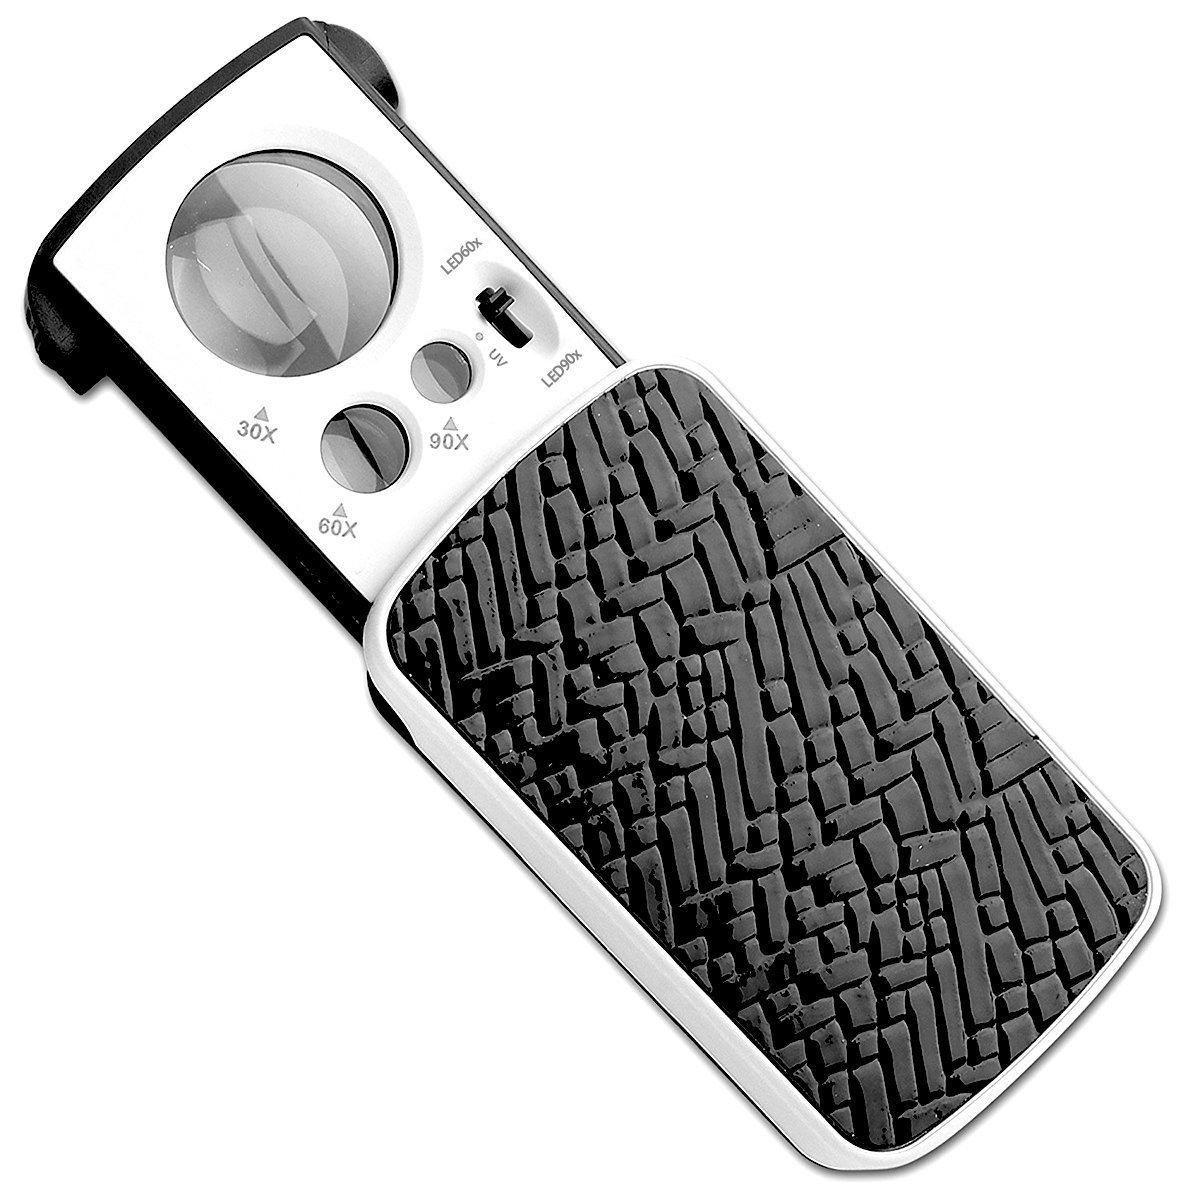 Sungpunet Jewelers Loupe, LED Iighted lente di ingrandimento 30x 60x 90x UV piccola lente d' ingrandimento portatile lente di ingrandimento–nero PHX